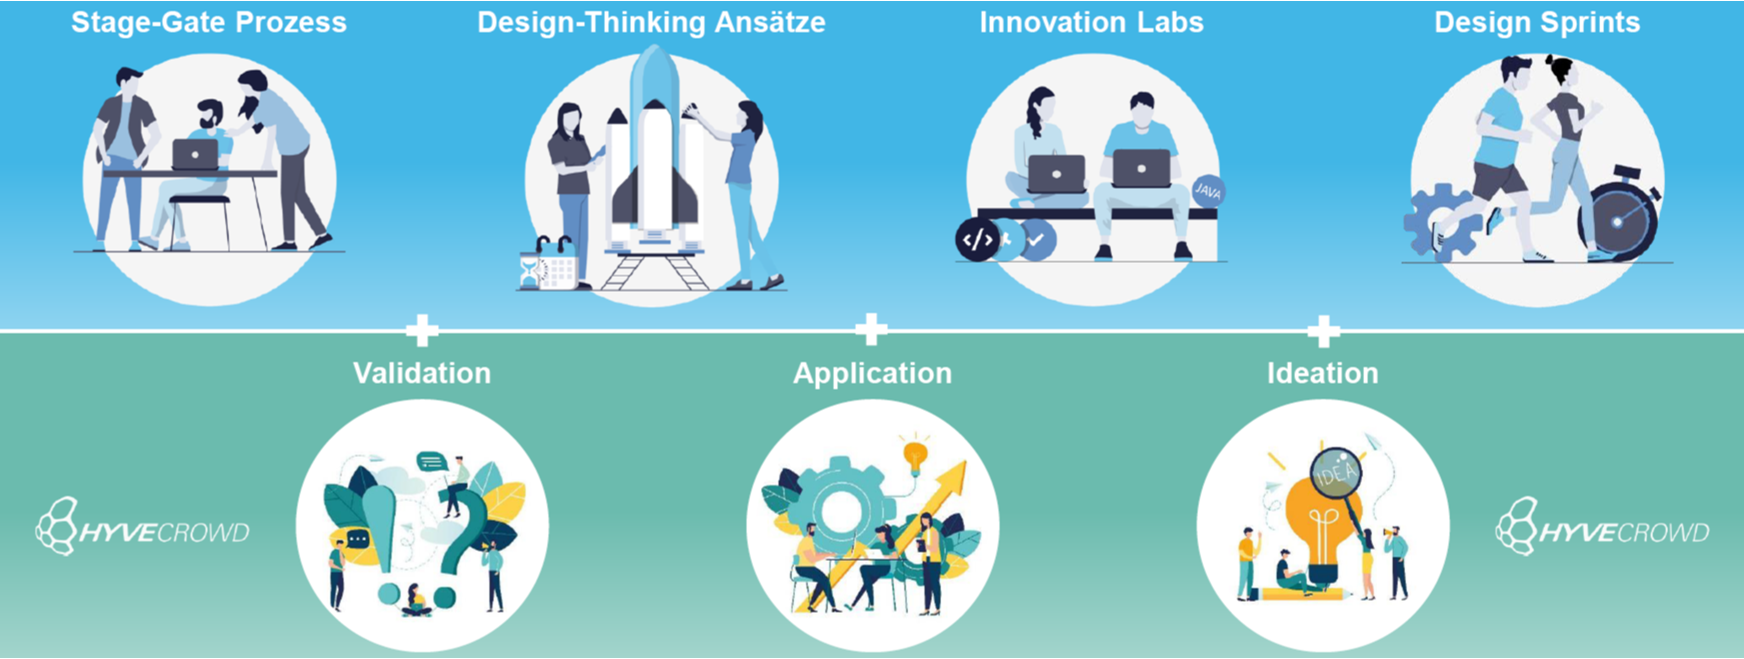 FRITZ - Open Innovation - Kombination